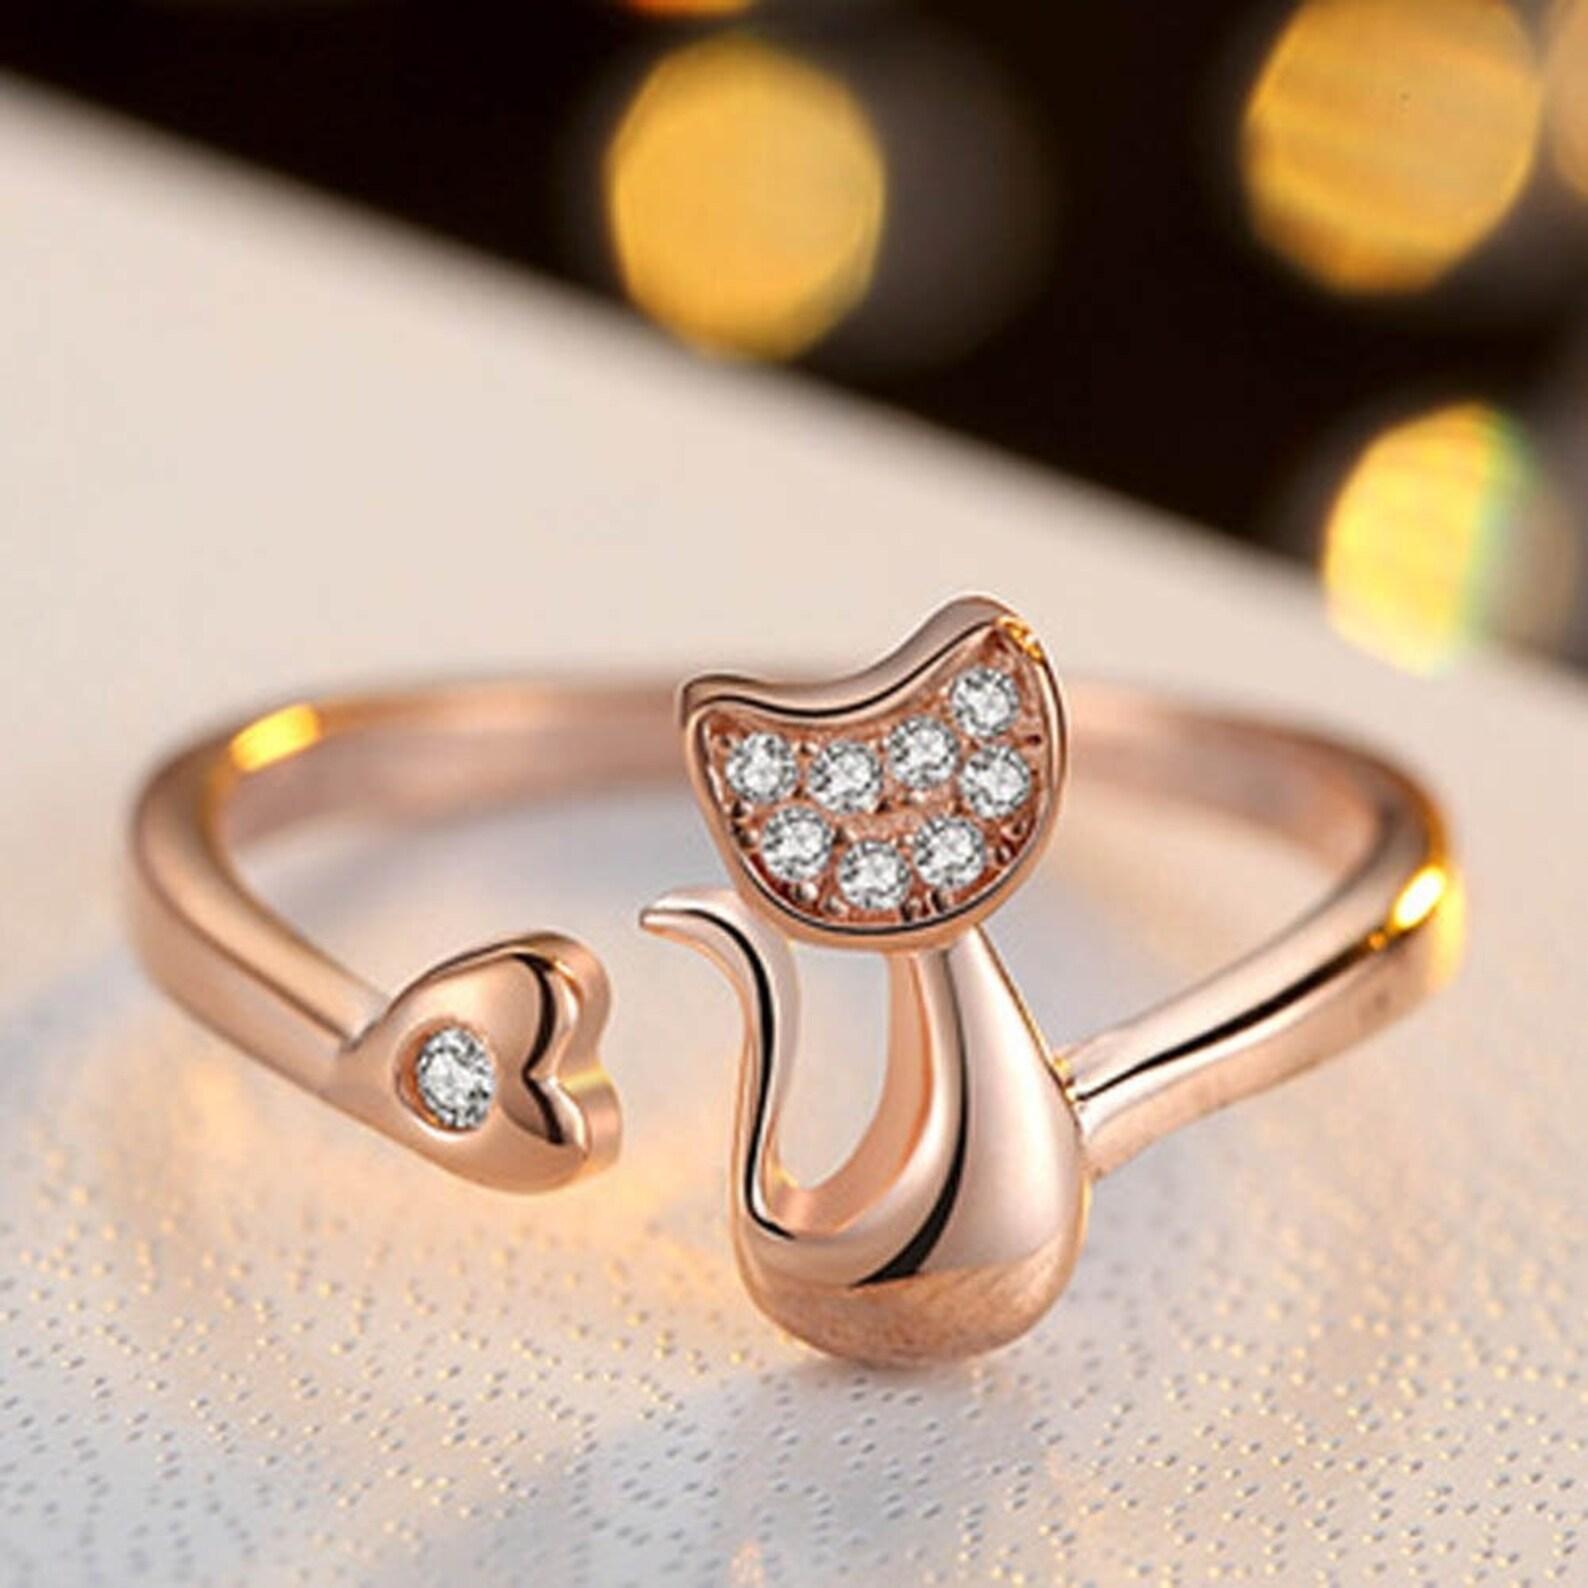 Adjustable Cat Heart Ring